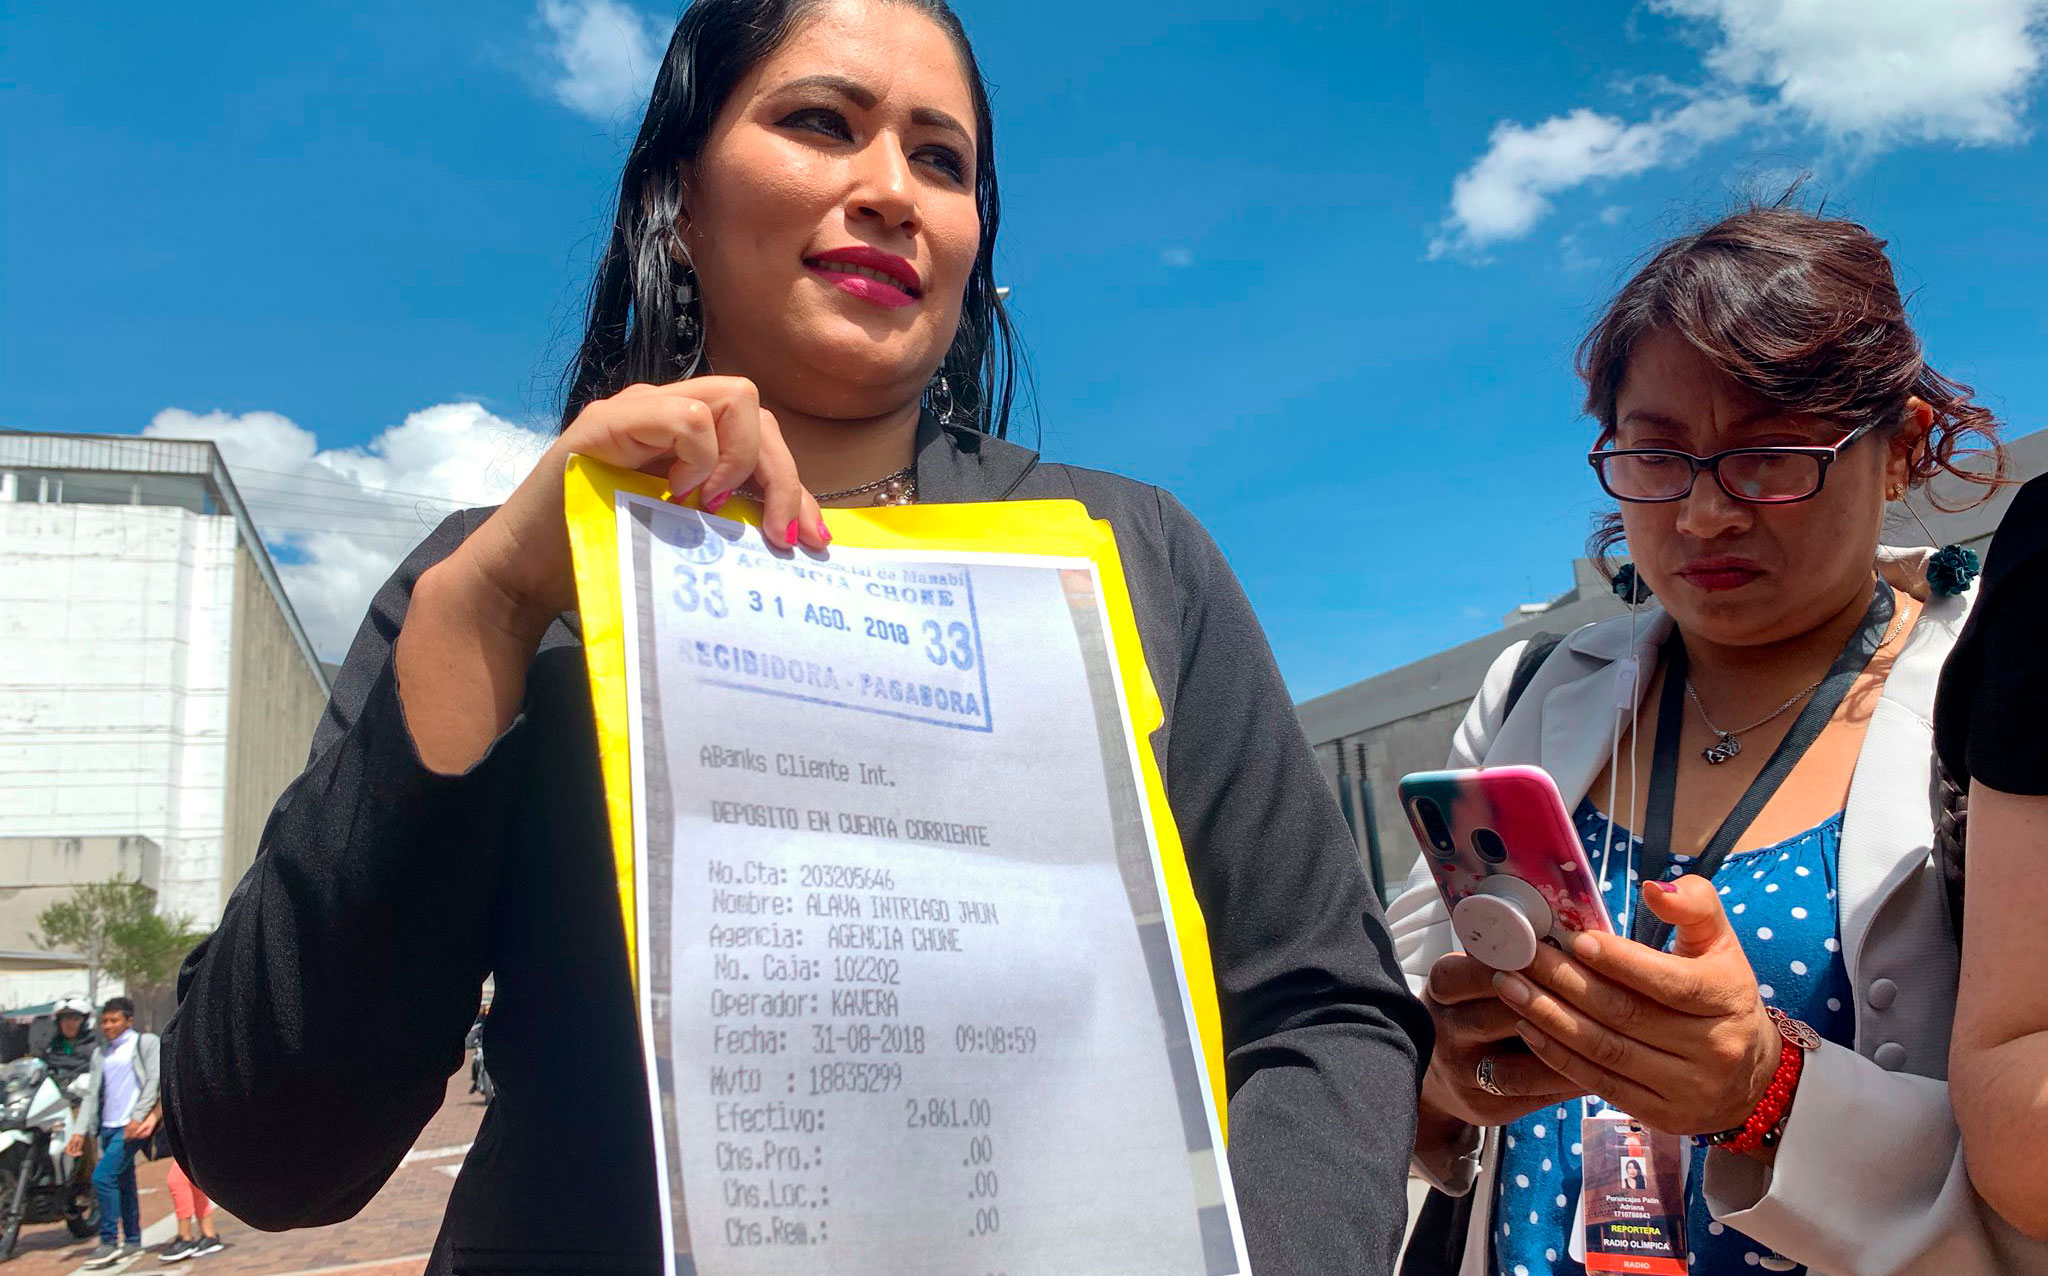 Tercera denuncia por  diezmos en contra de la asambleísta  Karina Arteaga